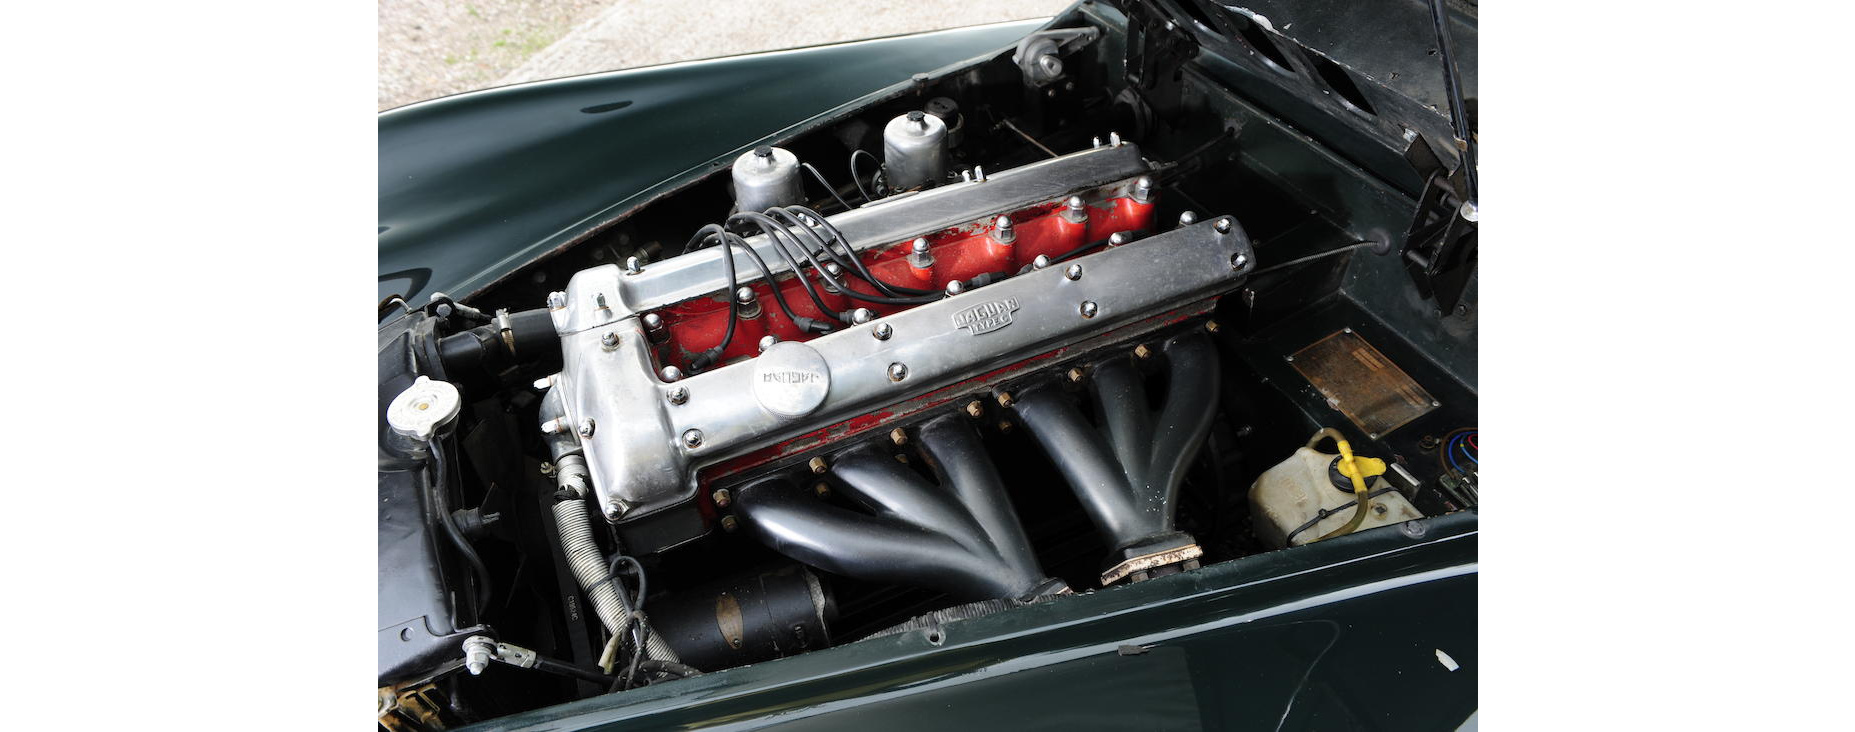 XK120 660864 s engine